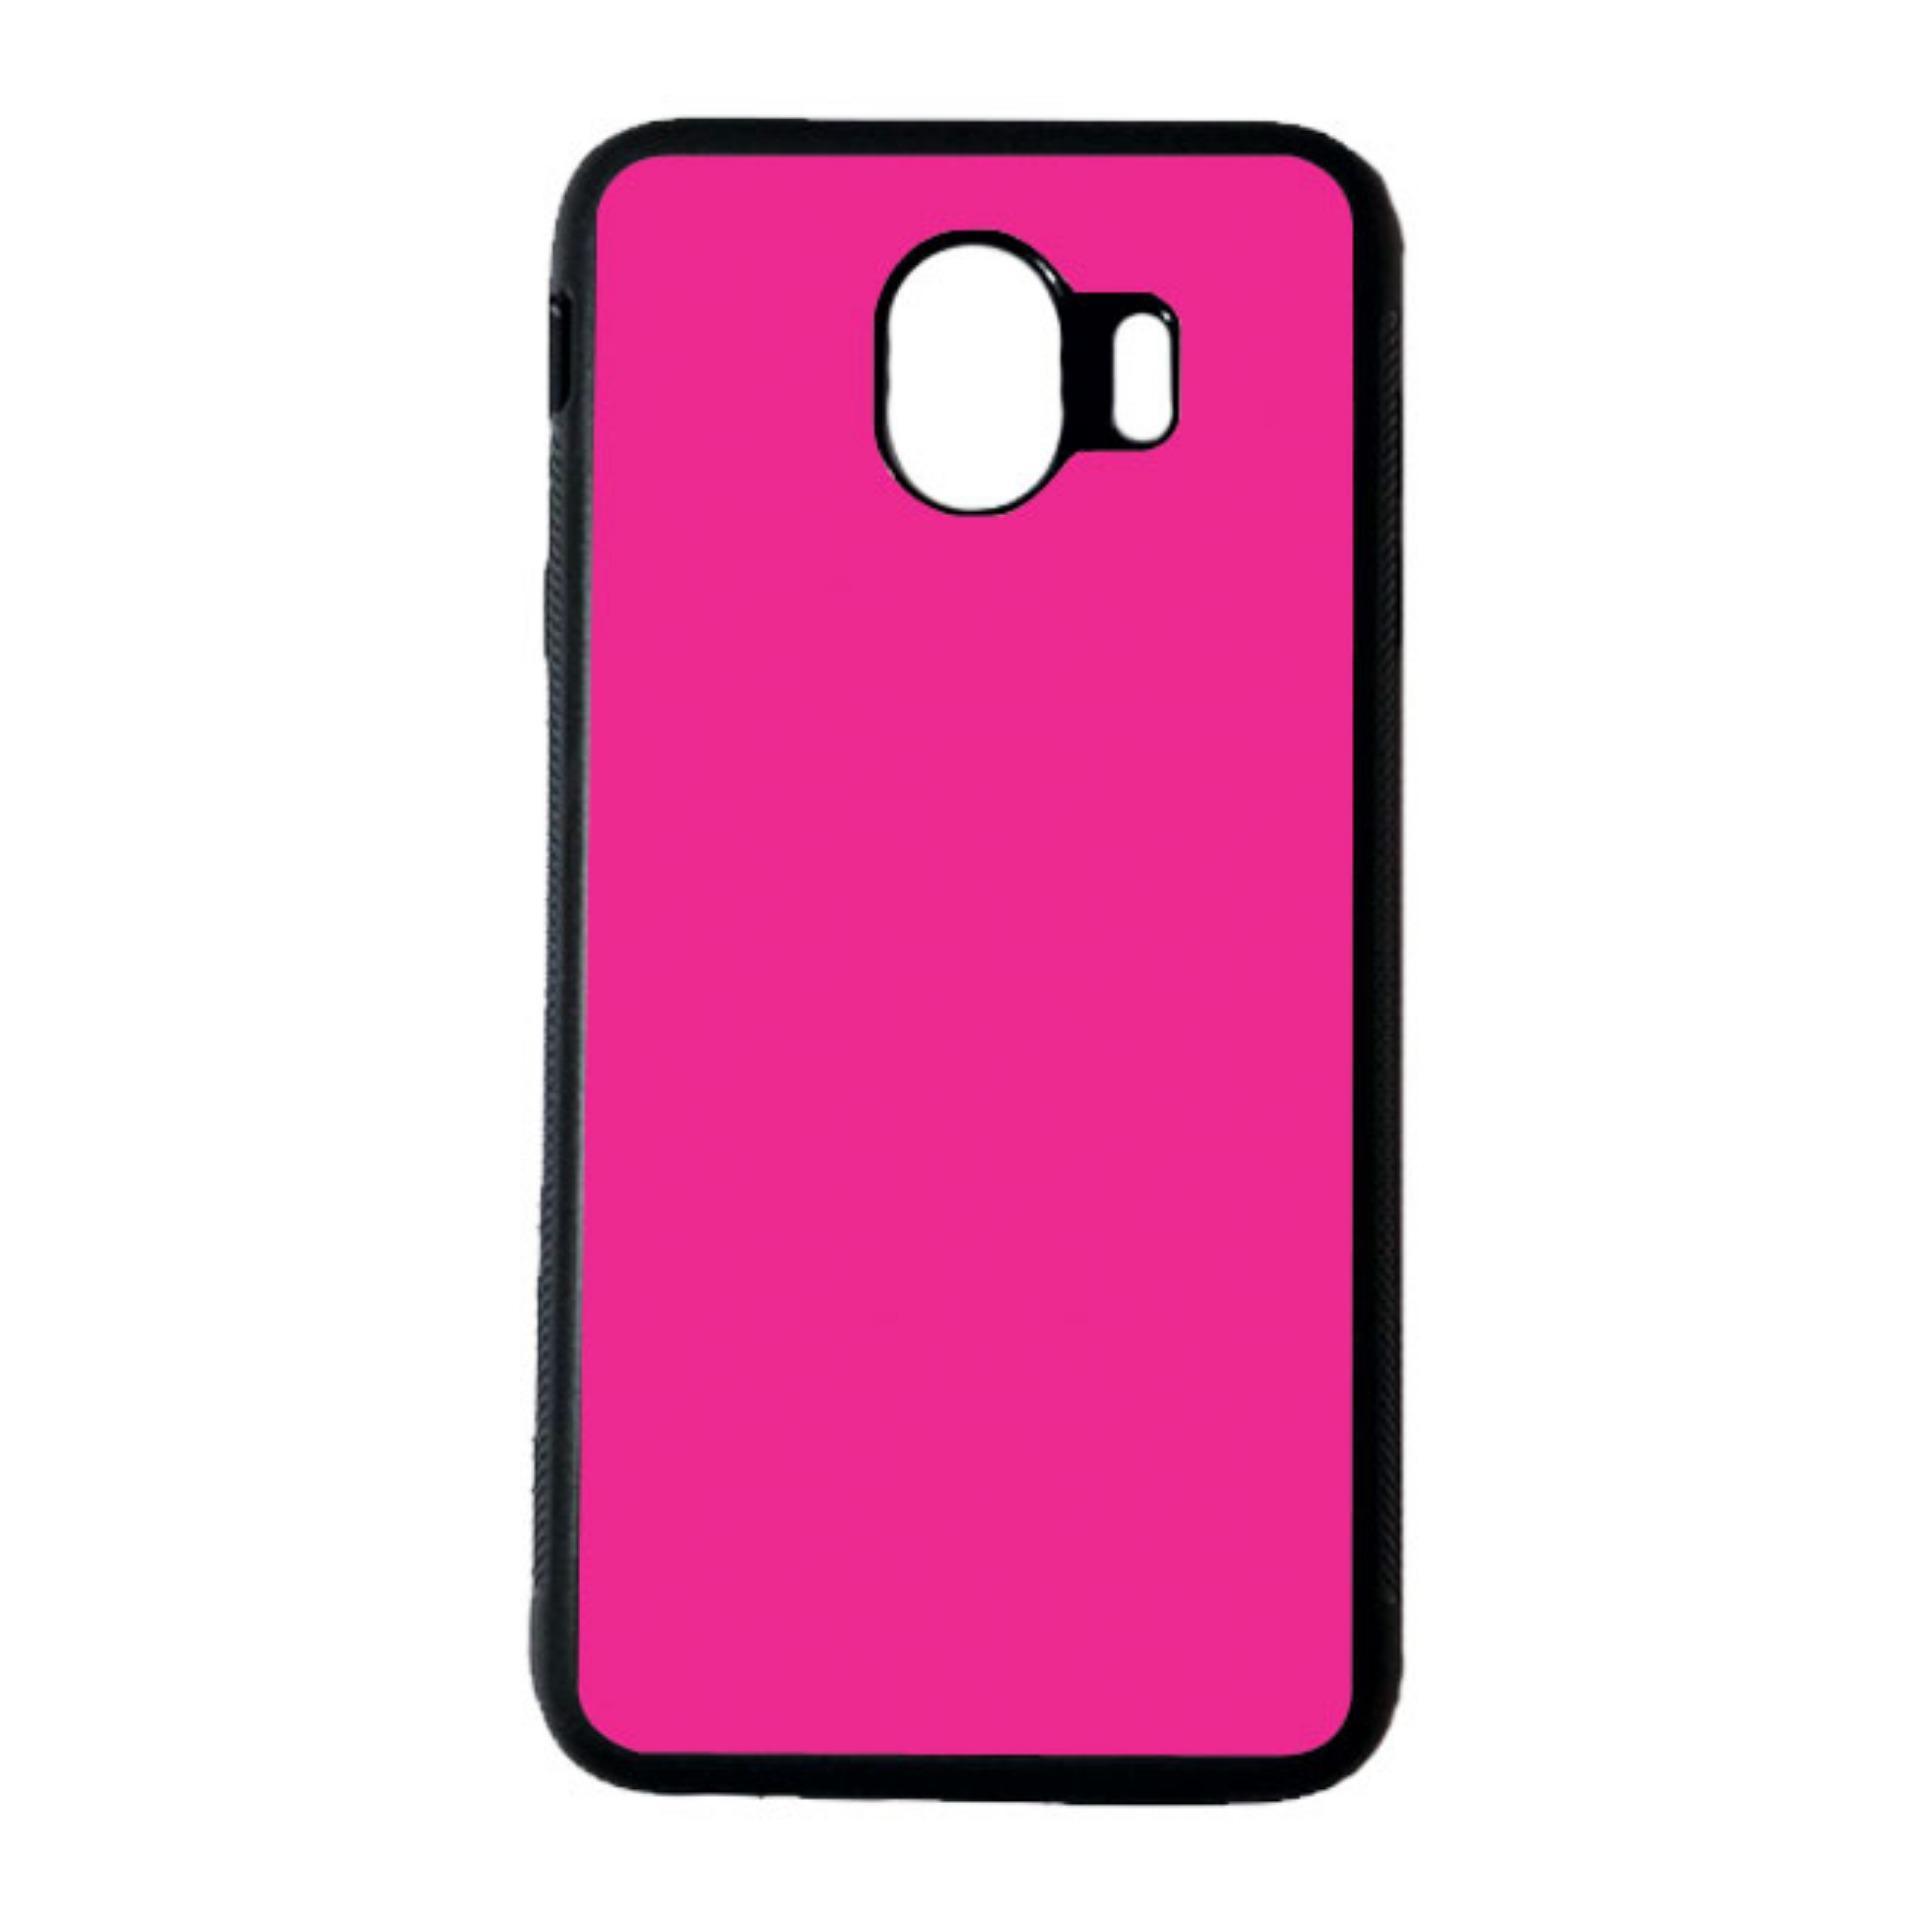 HEAVENCASE Casing Case Samsung Galaxy J4 2018 Softcase Hitam Motif Fucia Warna Pink